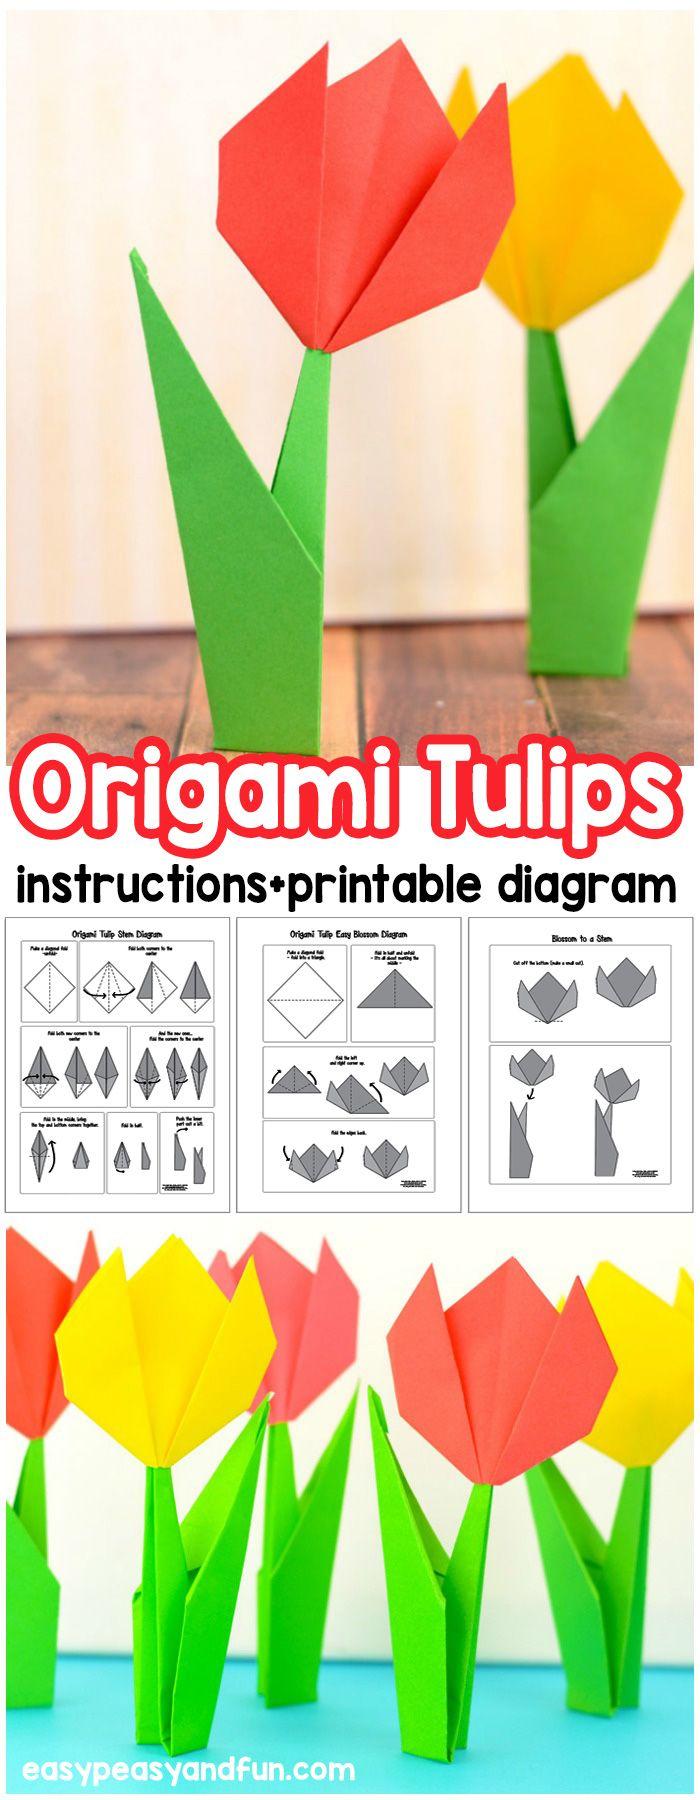 Best 25 tulip origami ideas on pinterest origami rose origami how to make origami flowers origami tulip tutorial with diagram floridaeventfo Images